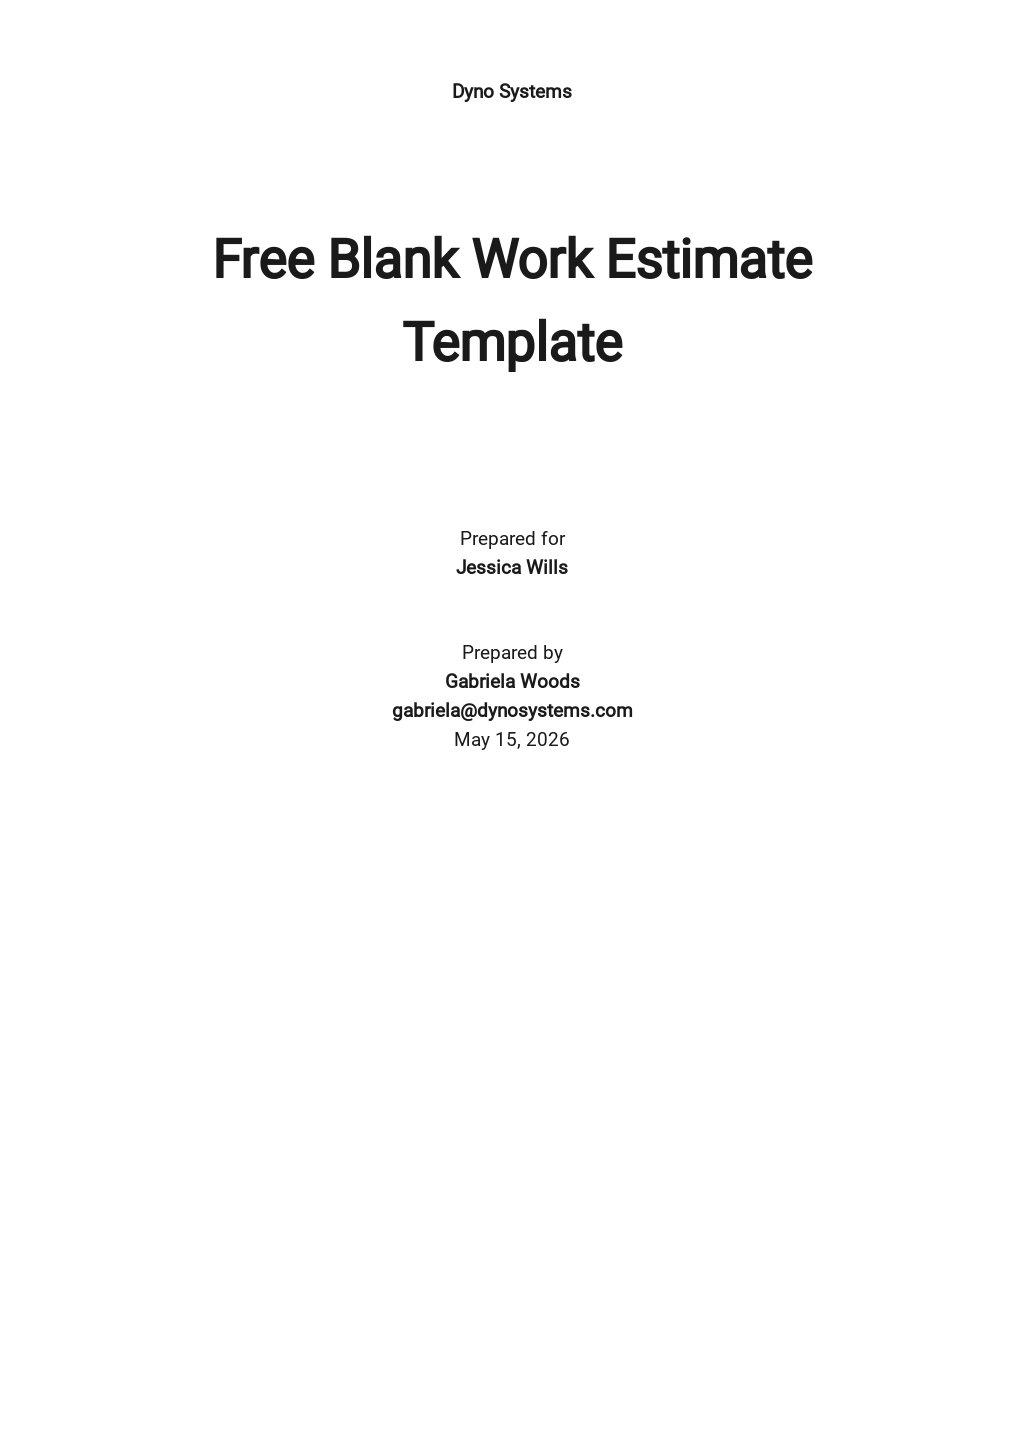 Free Blank Work Estimate Template.jpe